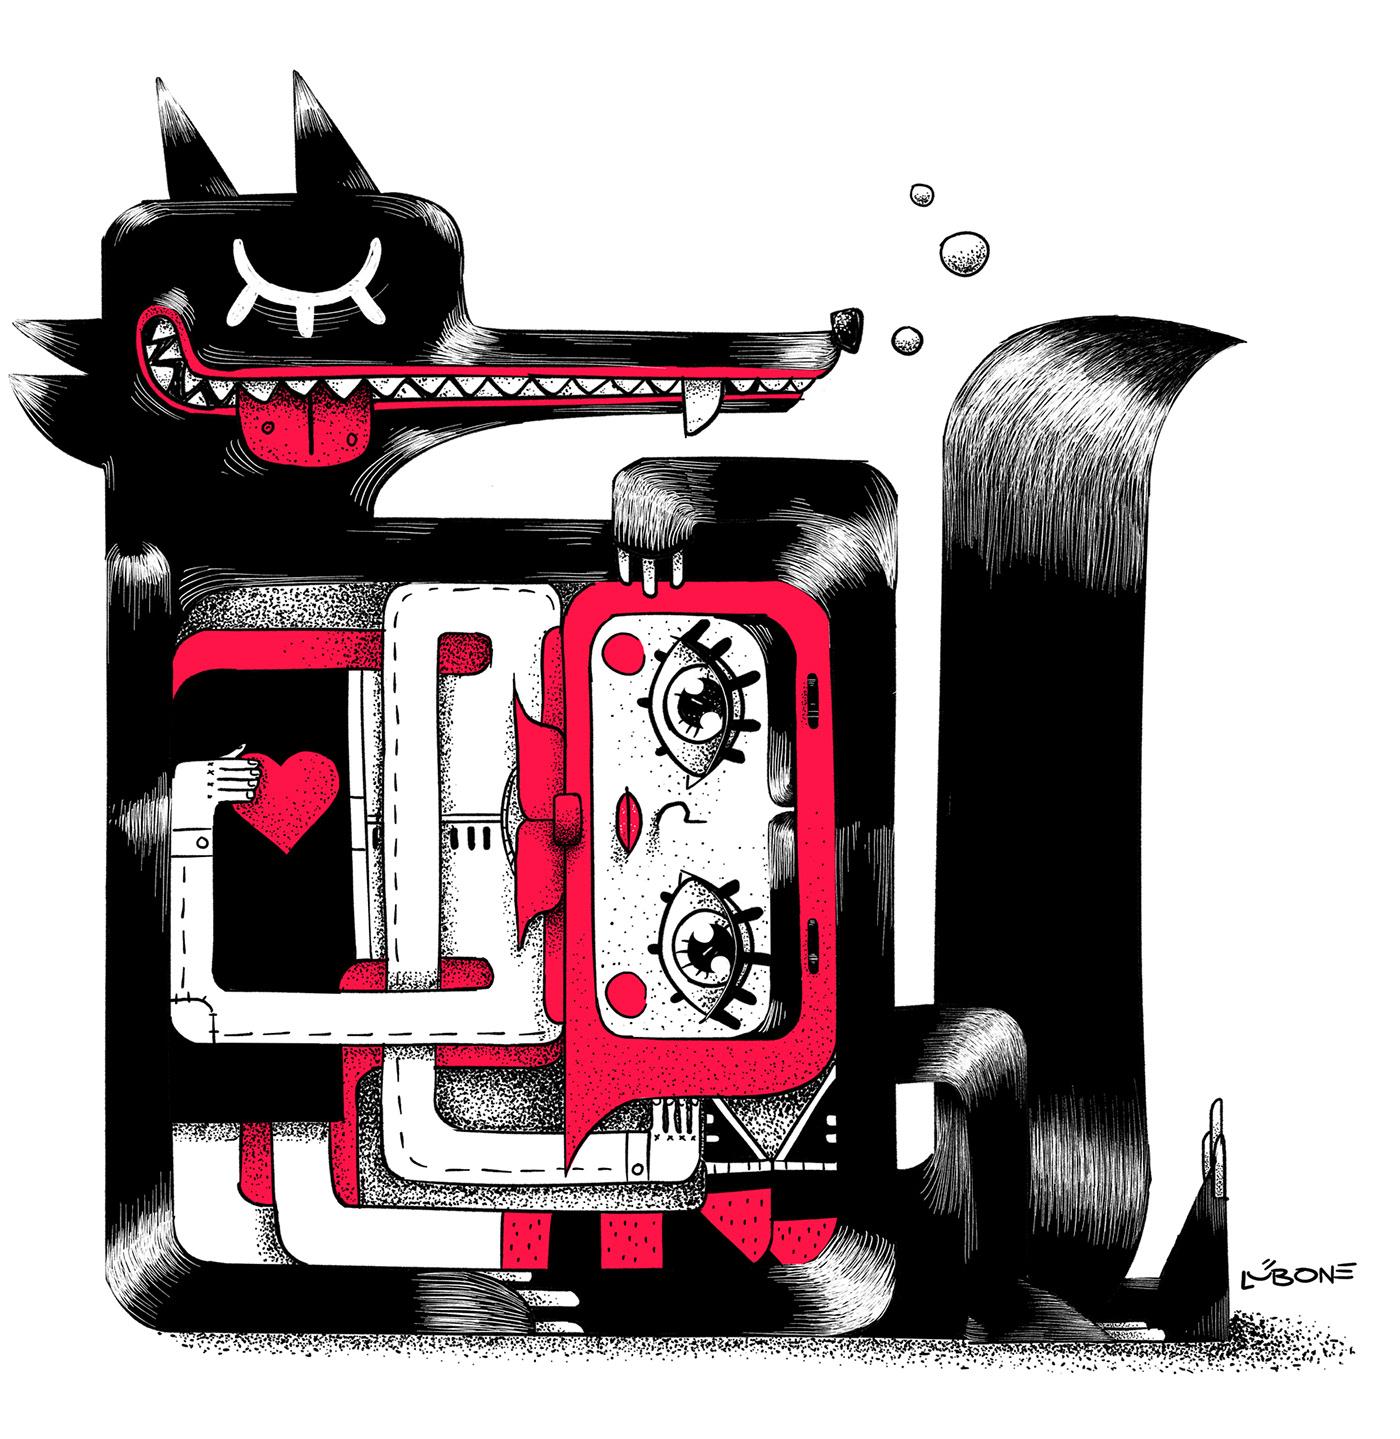 Lub One Иллюстрация, Цифровое искусство, Дизайн персонажей (6).jpg